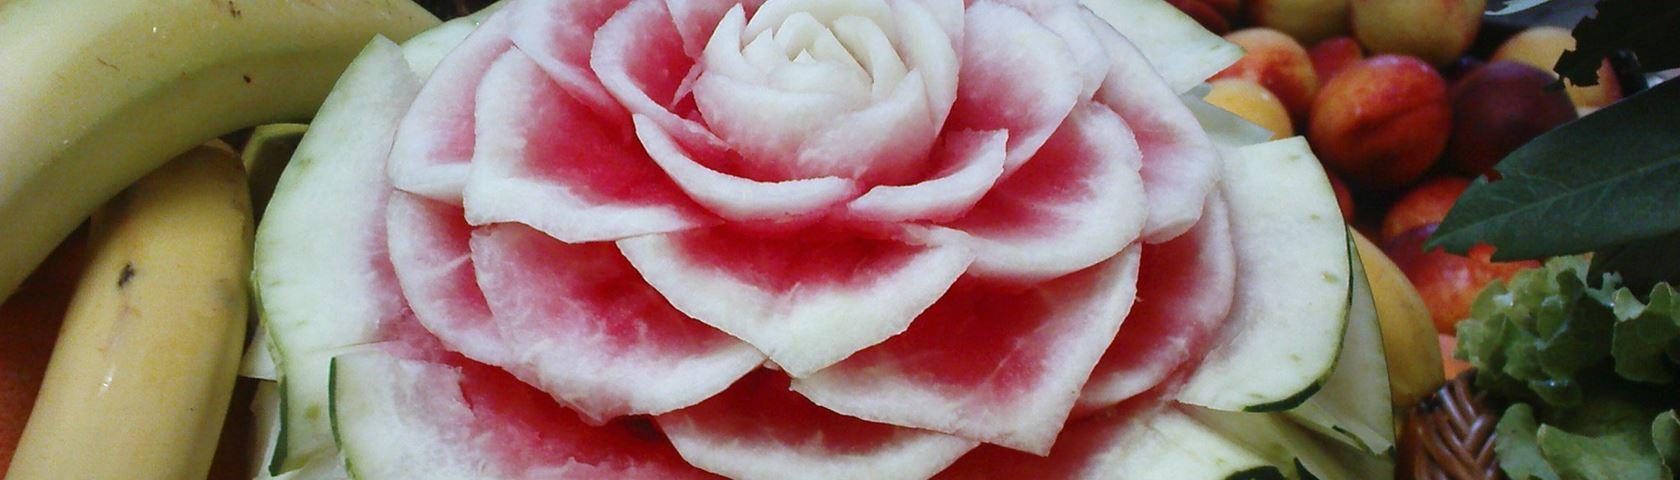 Floral Watermelon